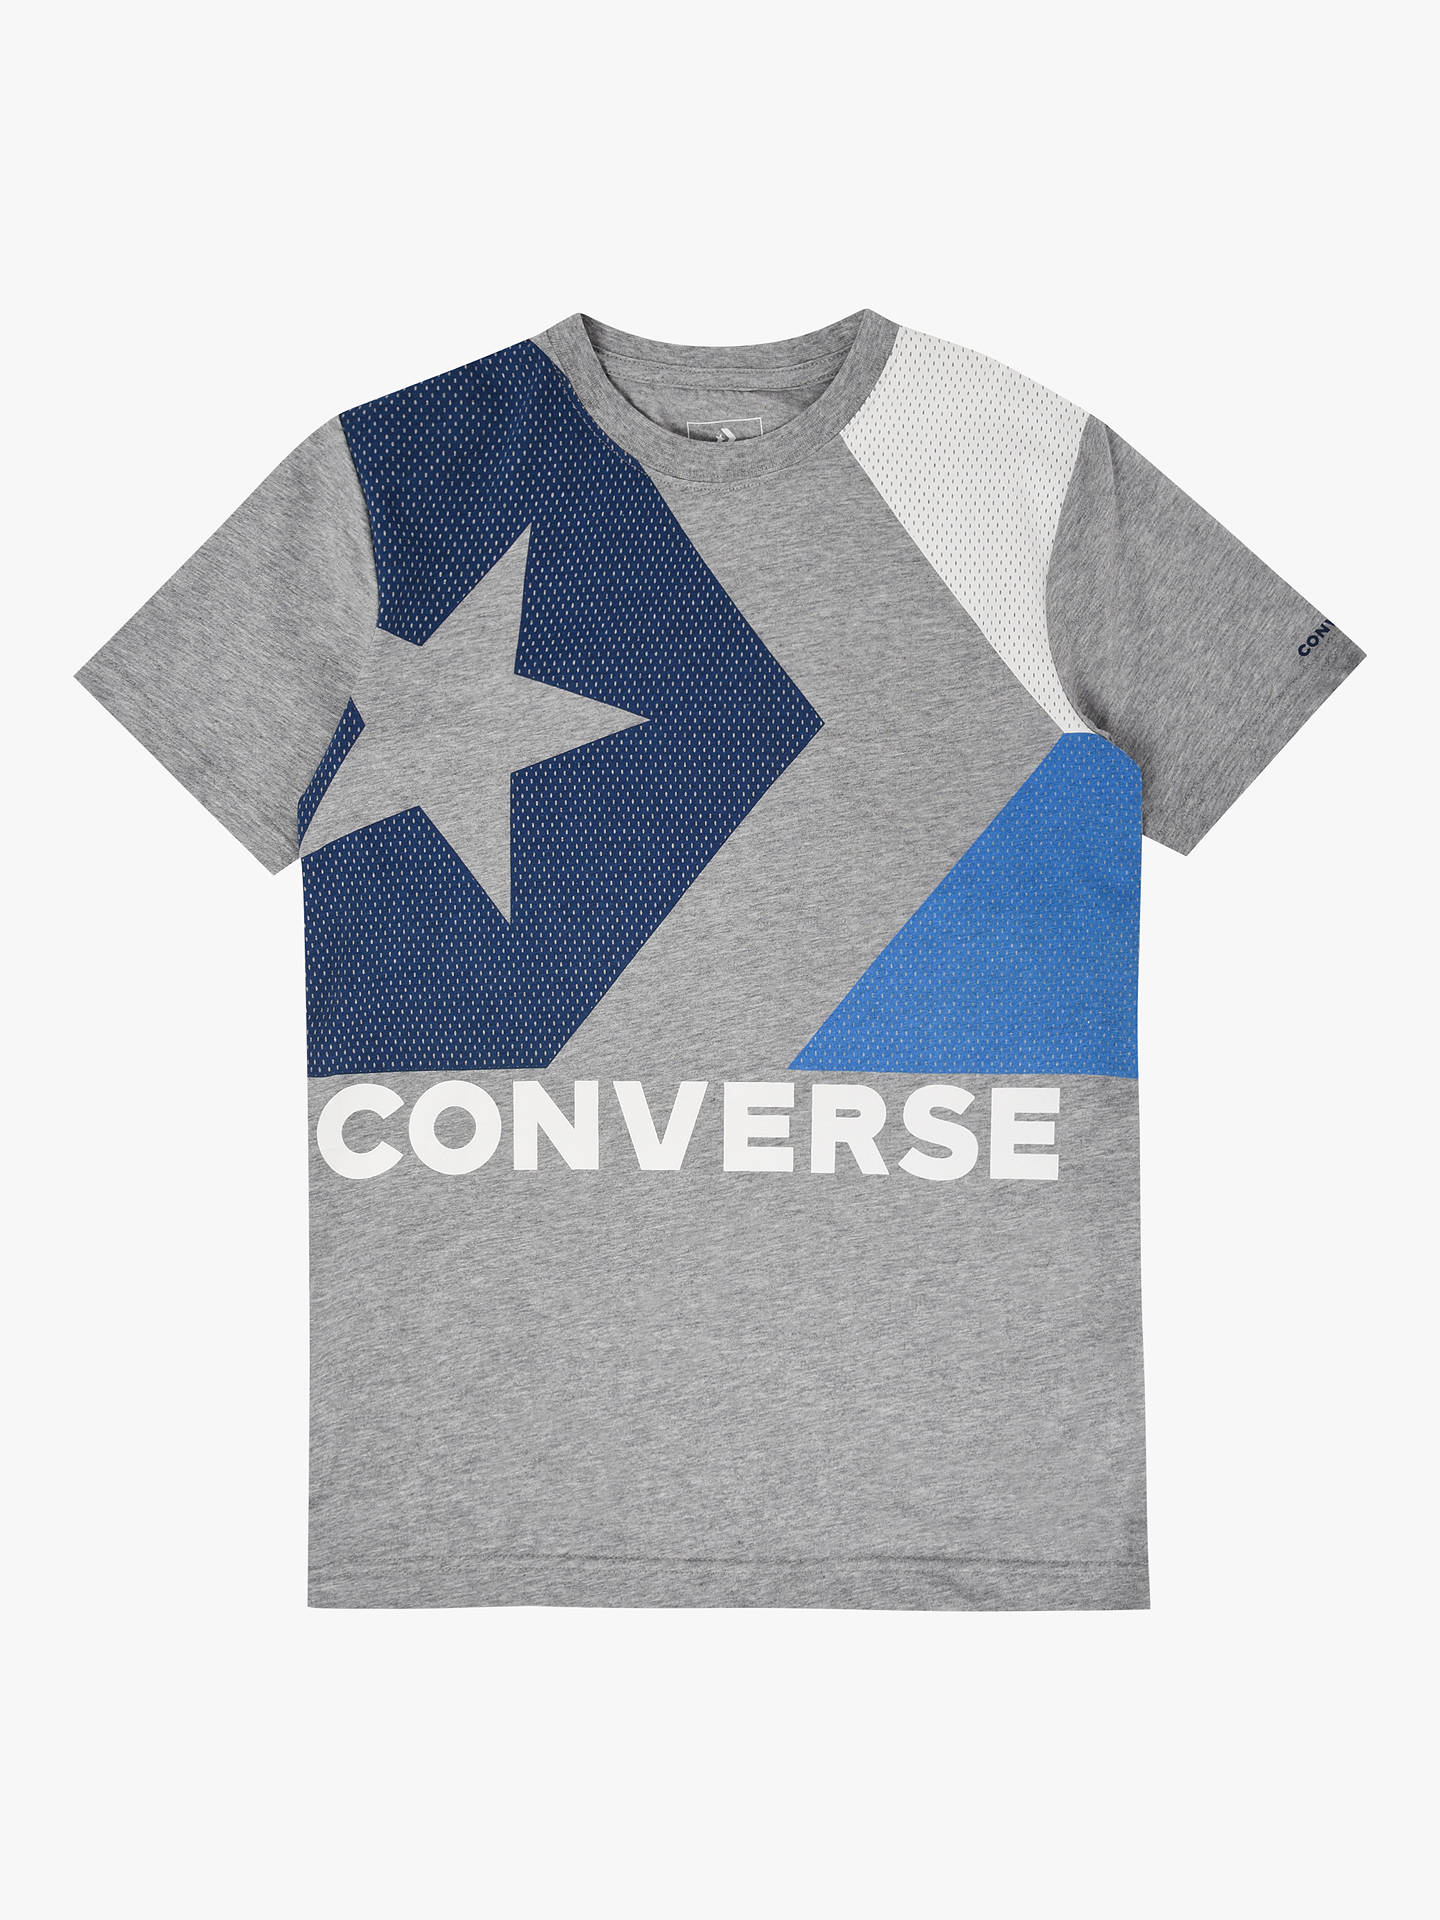 72accc588b Converse Boys' Box Print T-Shirt, Grey at John Lewis & Partners